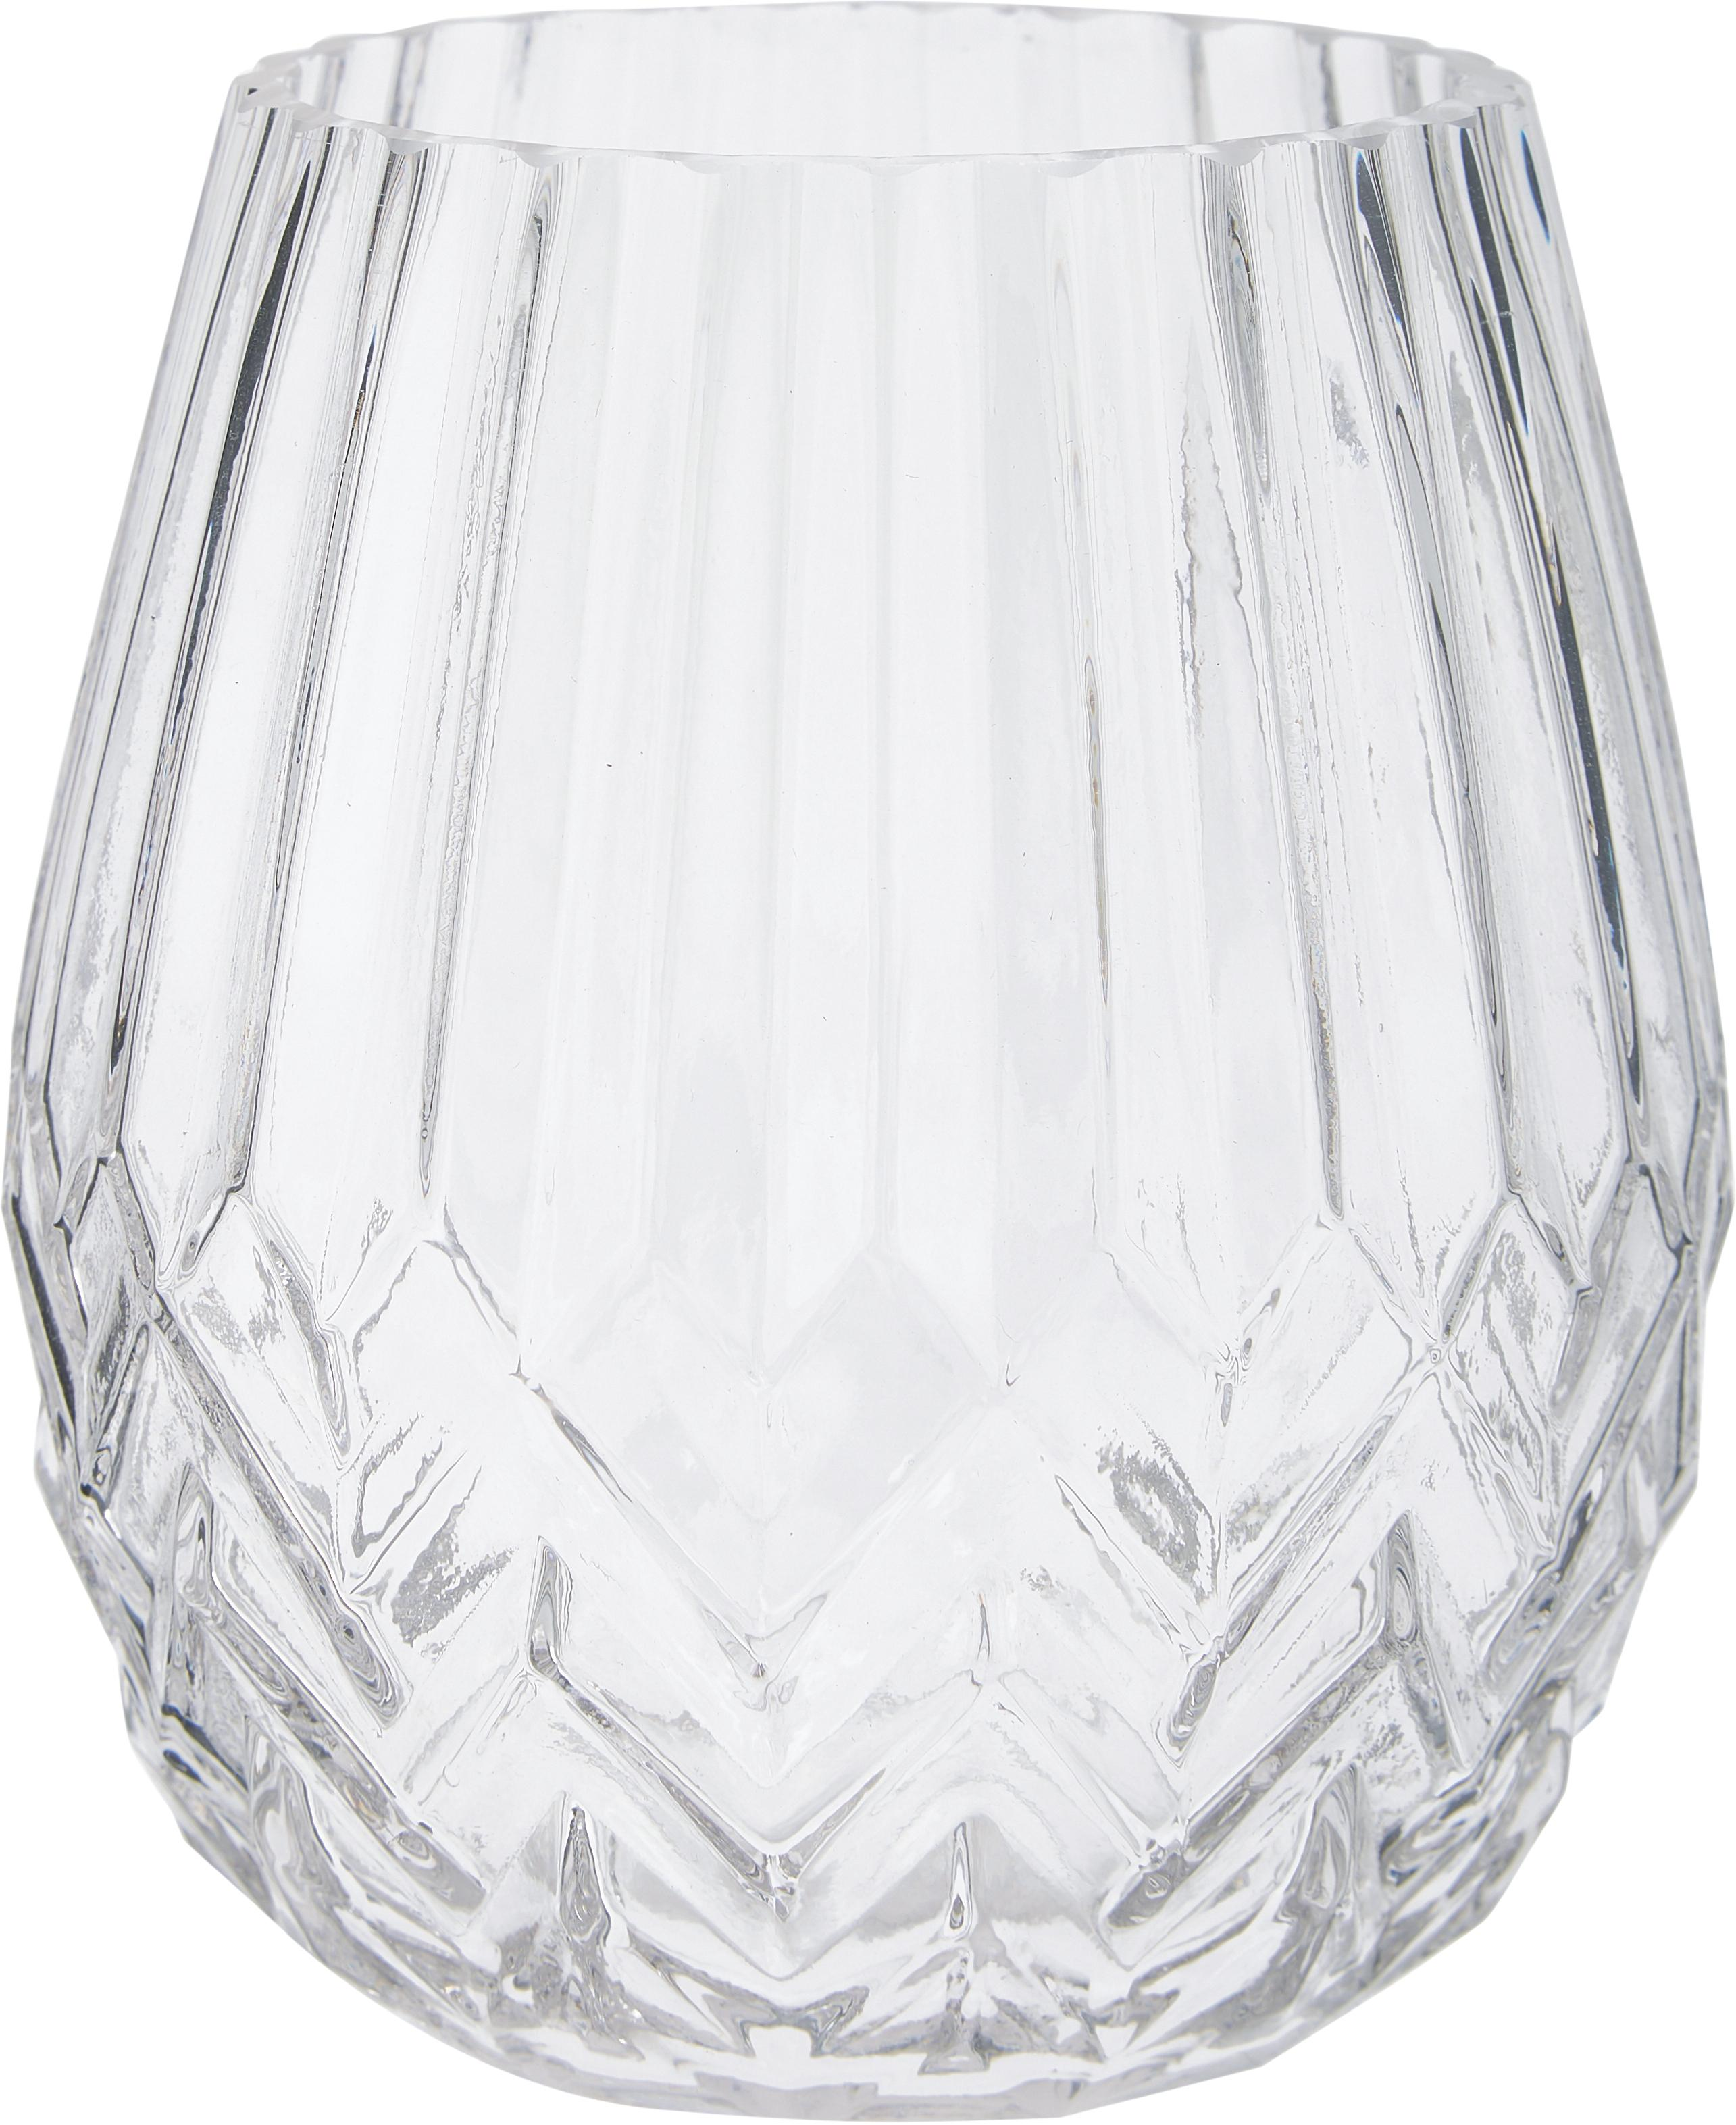 Vaas Luna, Glas, Transparant, Ø 14 x H 17 cm